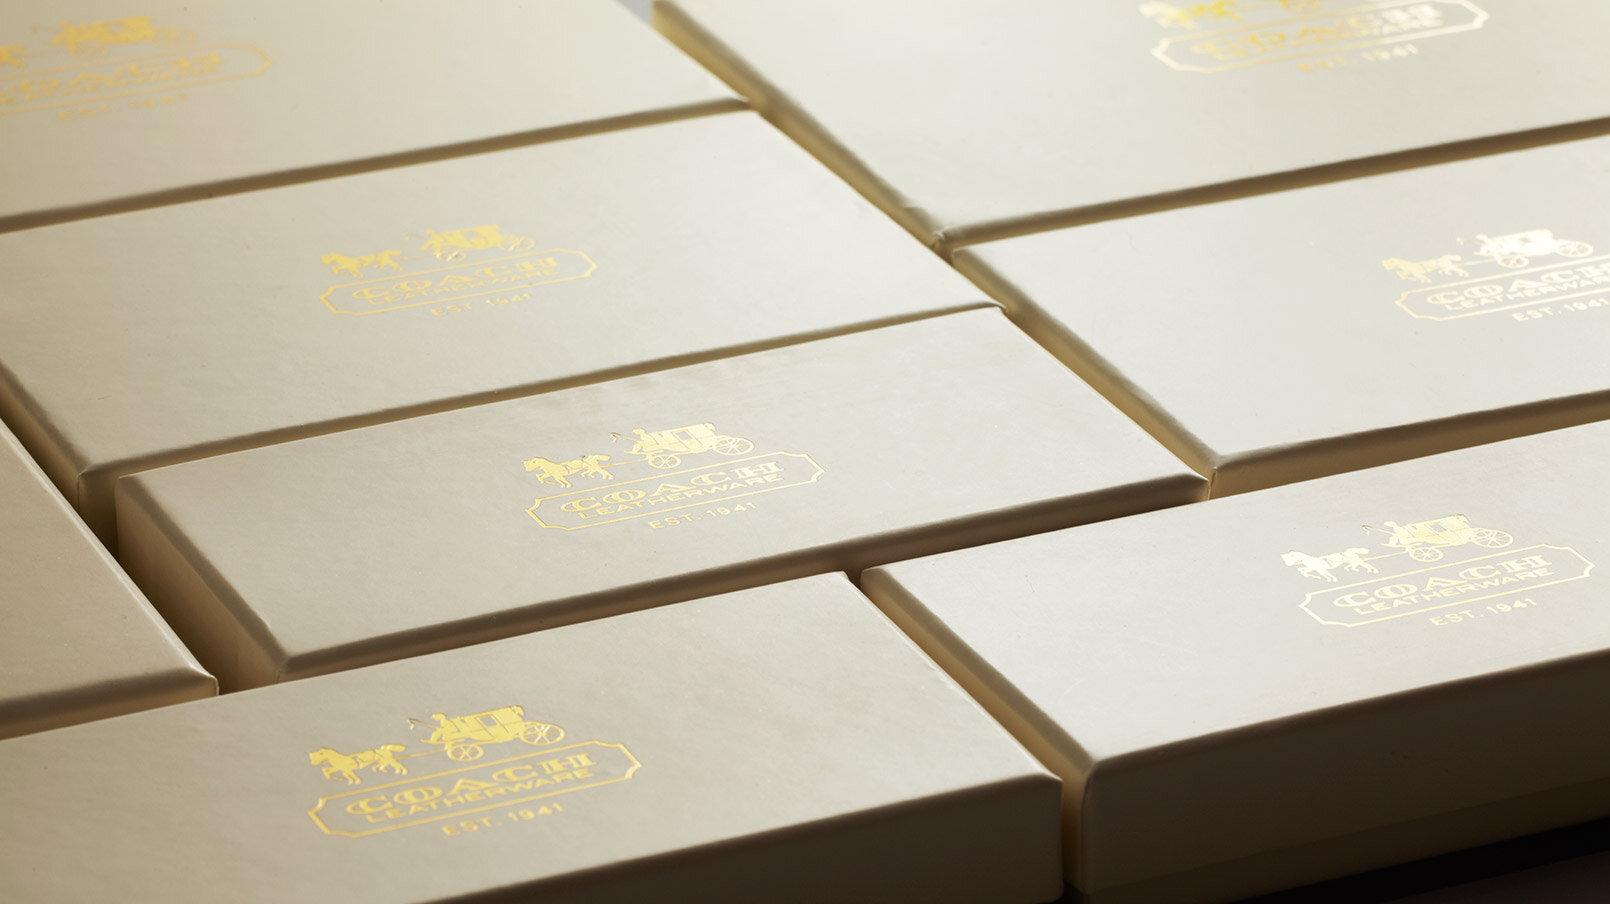 Coach-Box-Design-Packaging-Company-2.JPG